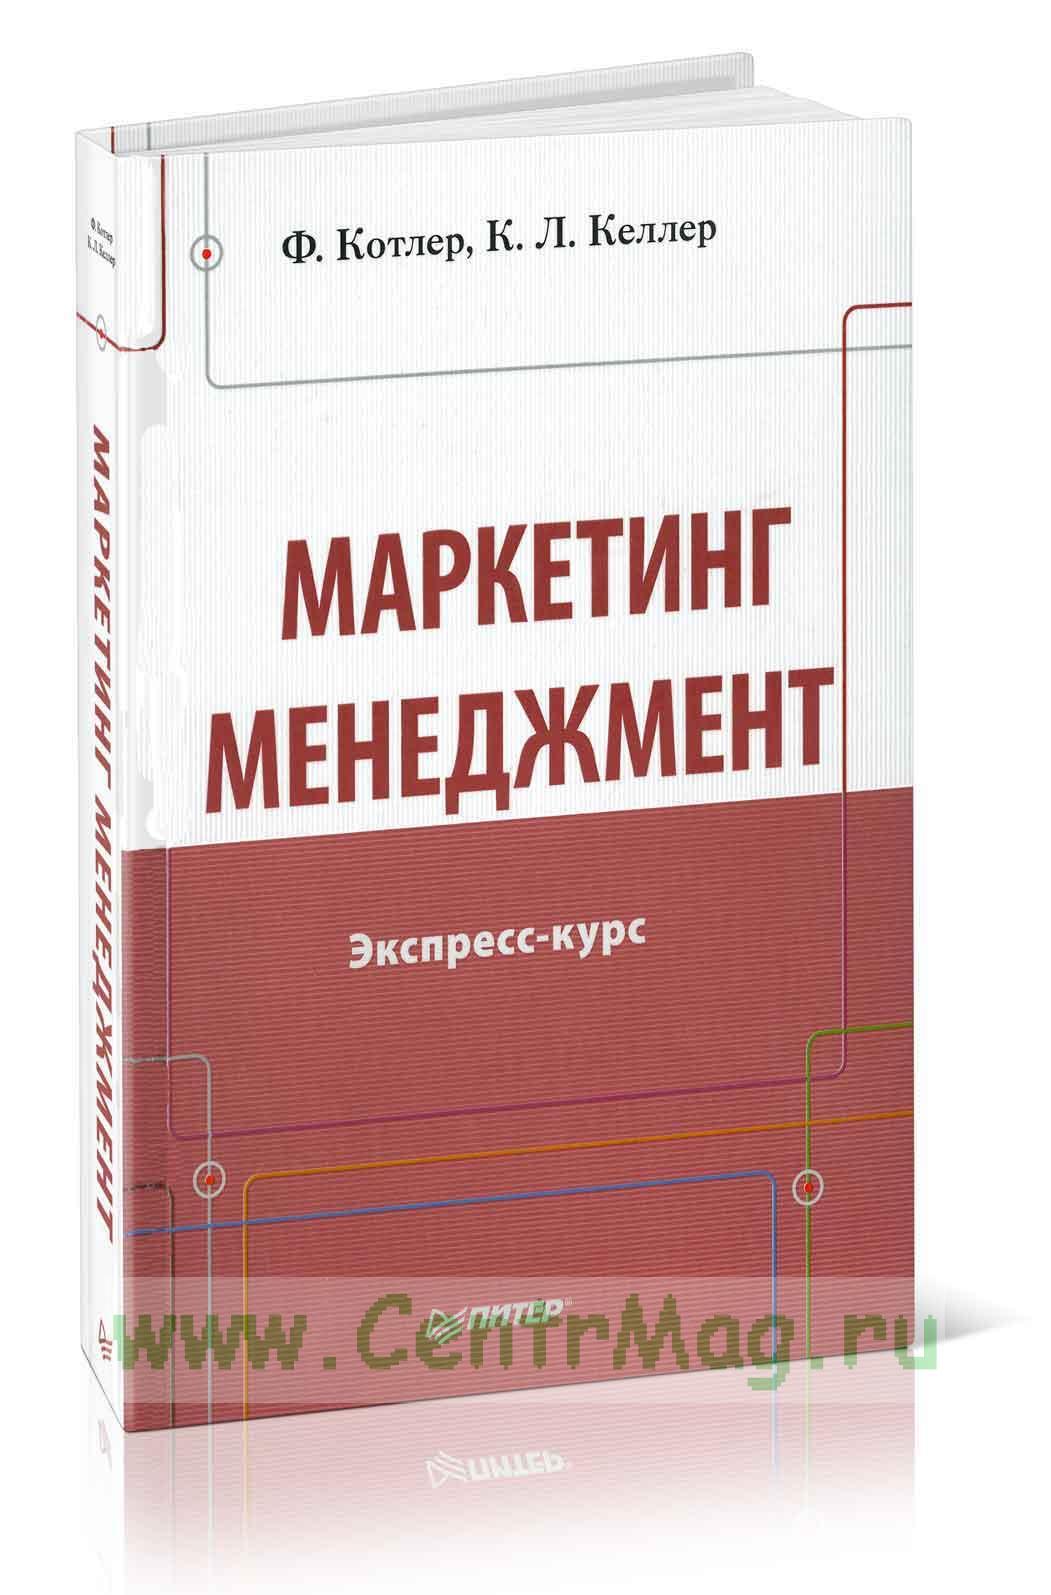 Маркетинг менеджмент. Экспресс-курс (3-е издание)